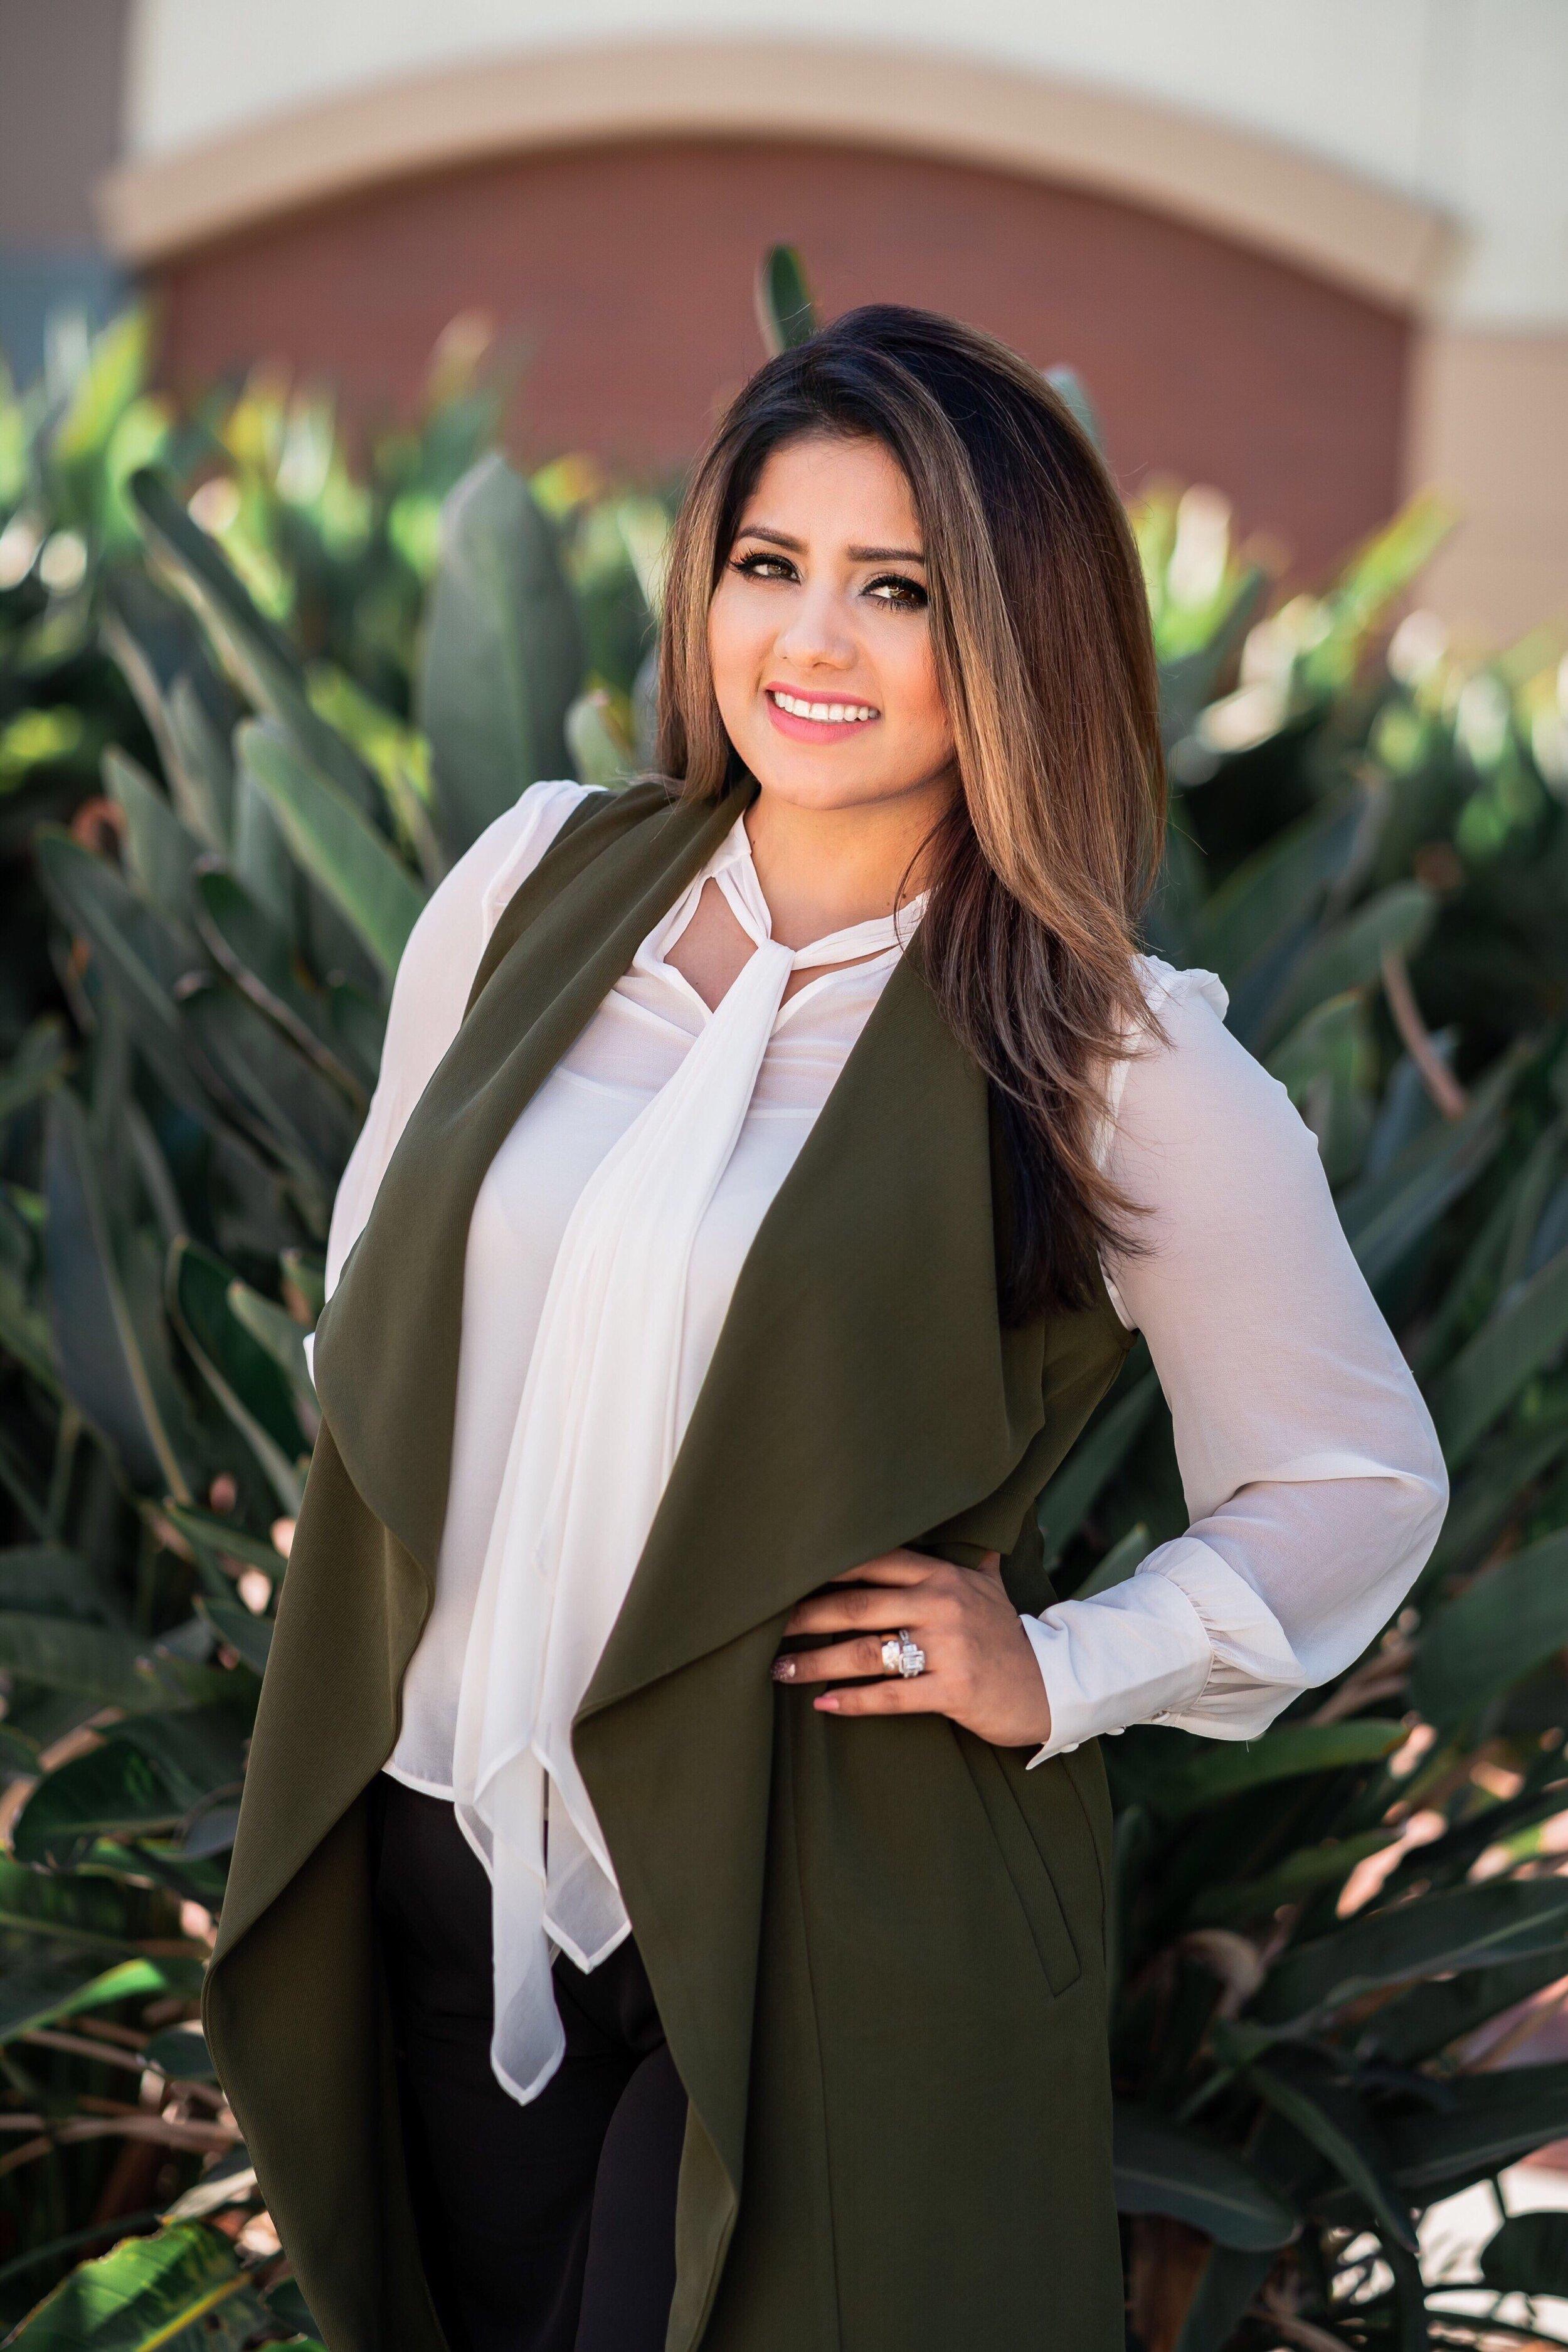 Marcela Zuniga, Corporate Relations Specialist, Education